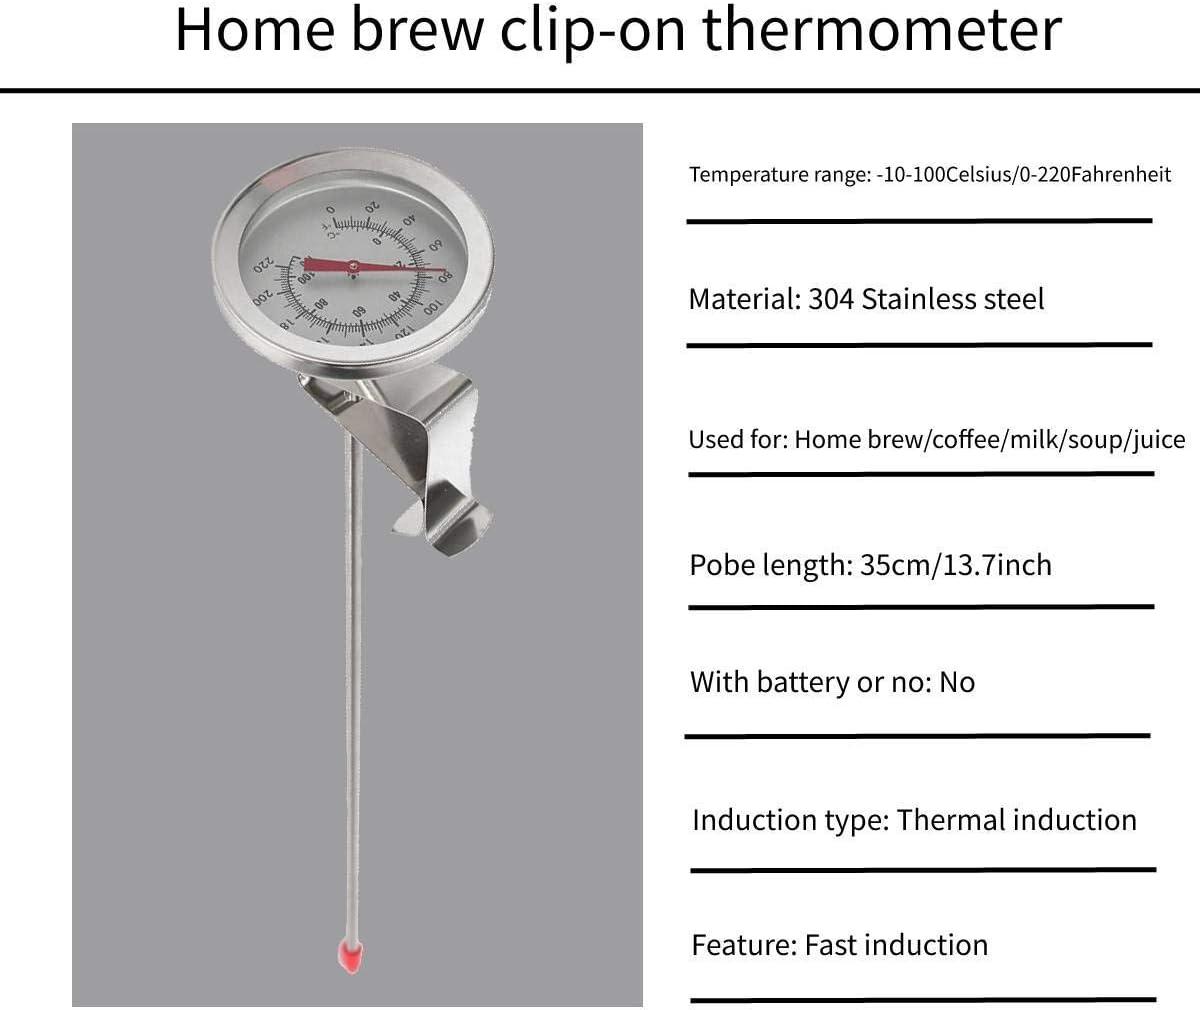 Jeffergarden 1 Unid Caldera Clip para Marcar Term/ómetro Home Brew Vino Cerveza Term/ómetros Acero Inoxidable Leche L/íquida Caliente Cocina Sonda de Yogur Temperatura